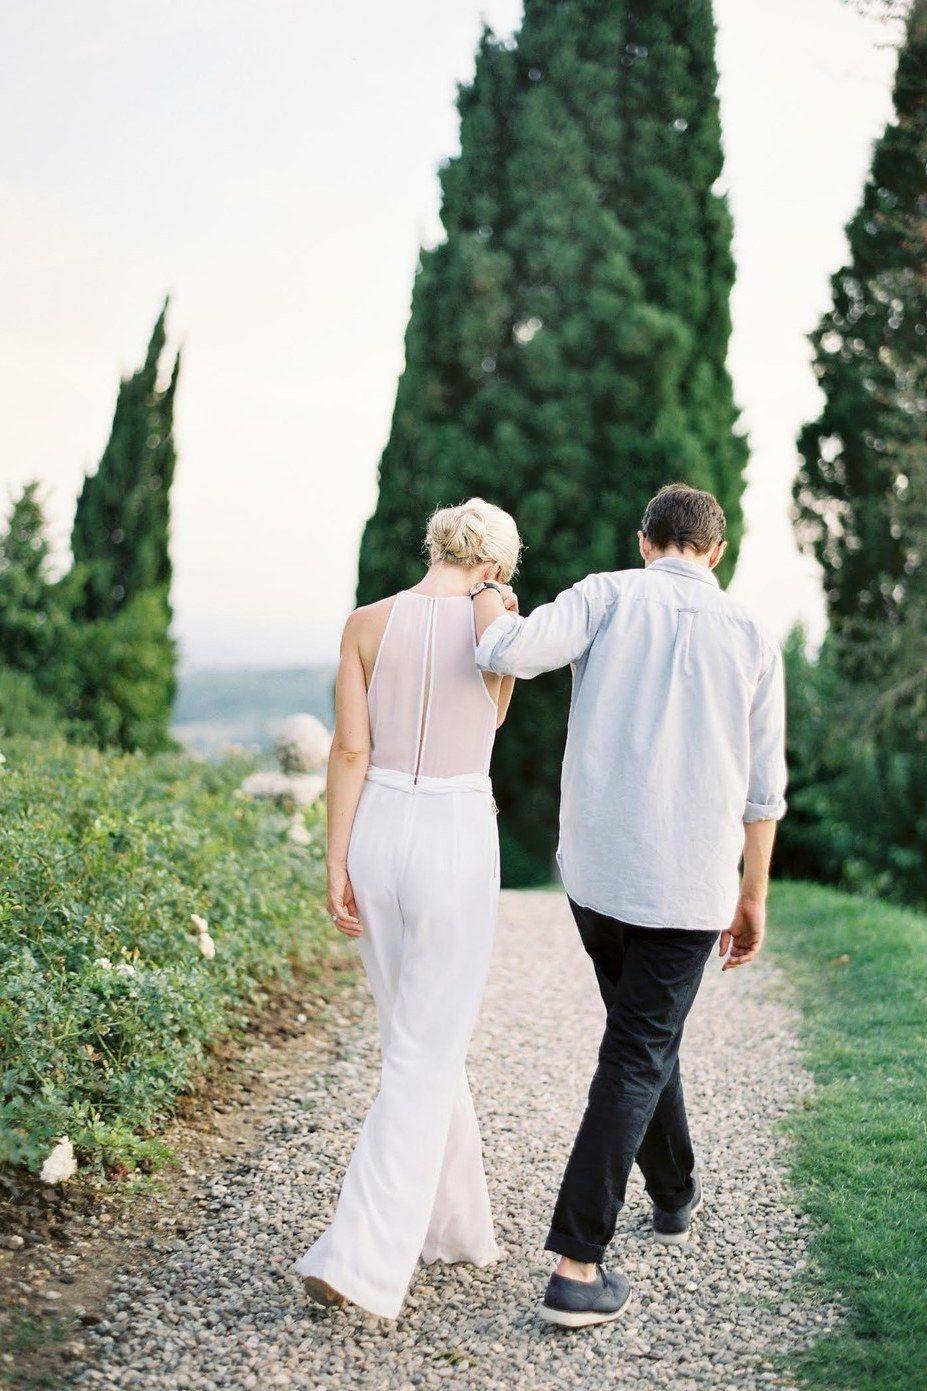 beautifully modern wedding dress ideas ideas dress ideas and